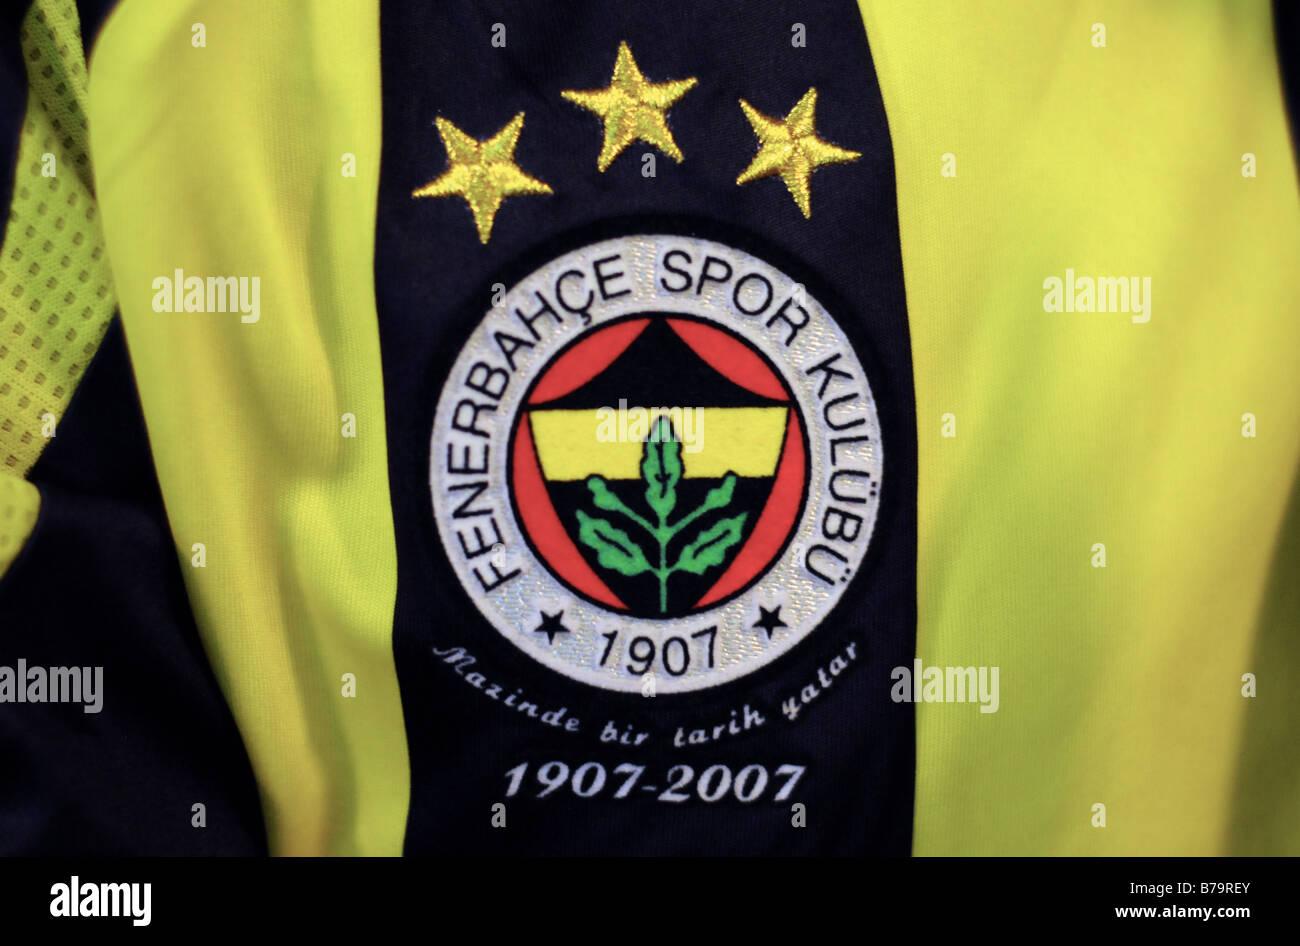 The club badge of Fenerbahce Football Club (Spor Kulubu), worn on a shirt in Eminonu, Istanbul. - Stock Image